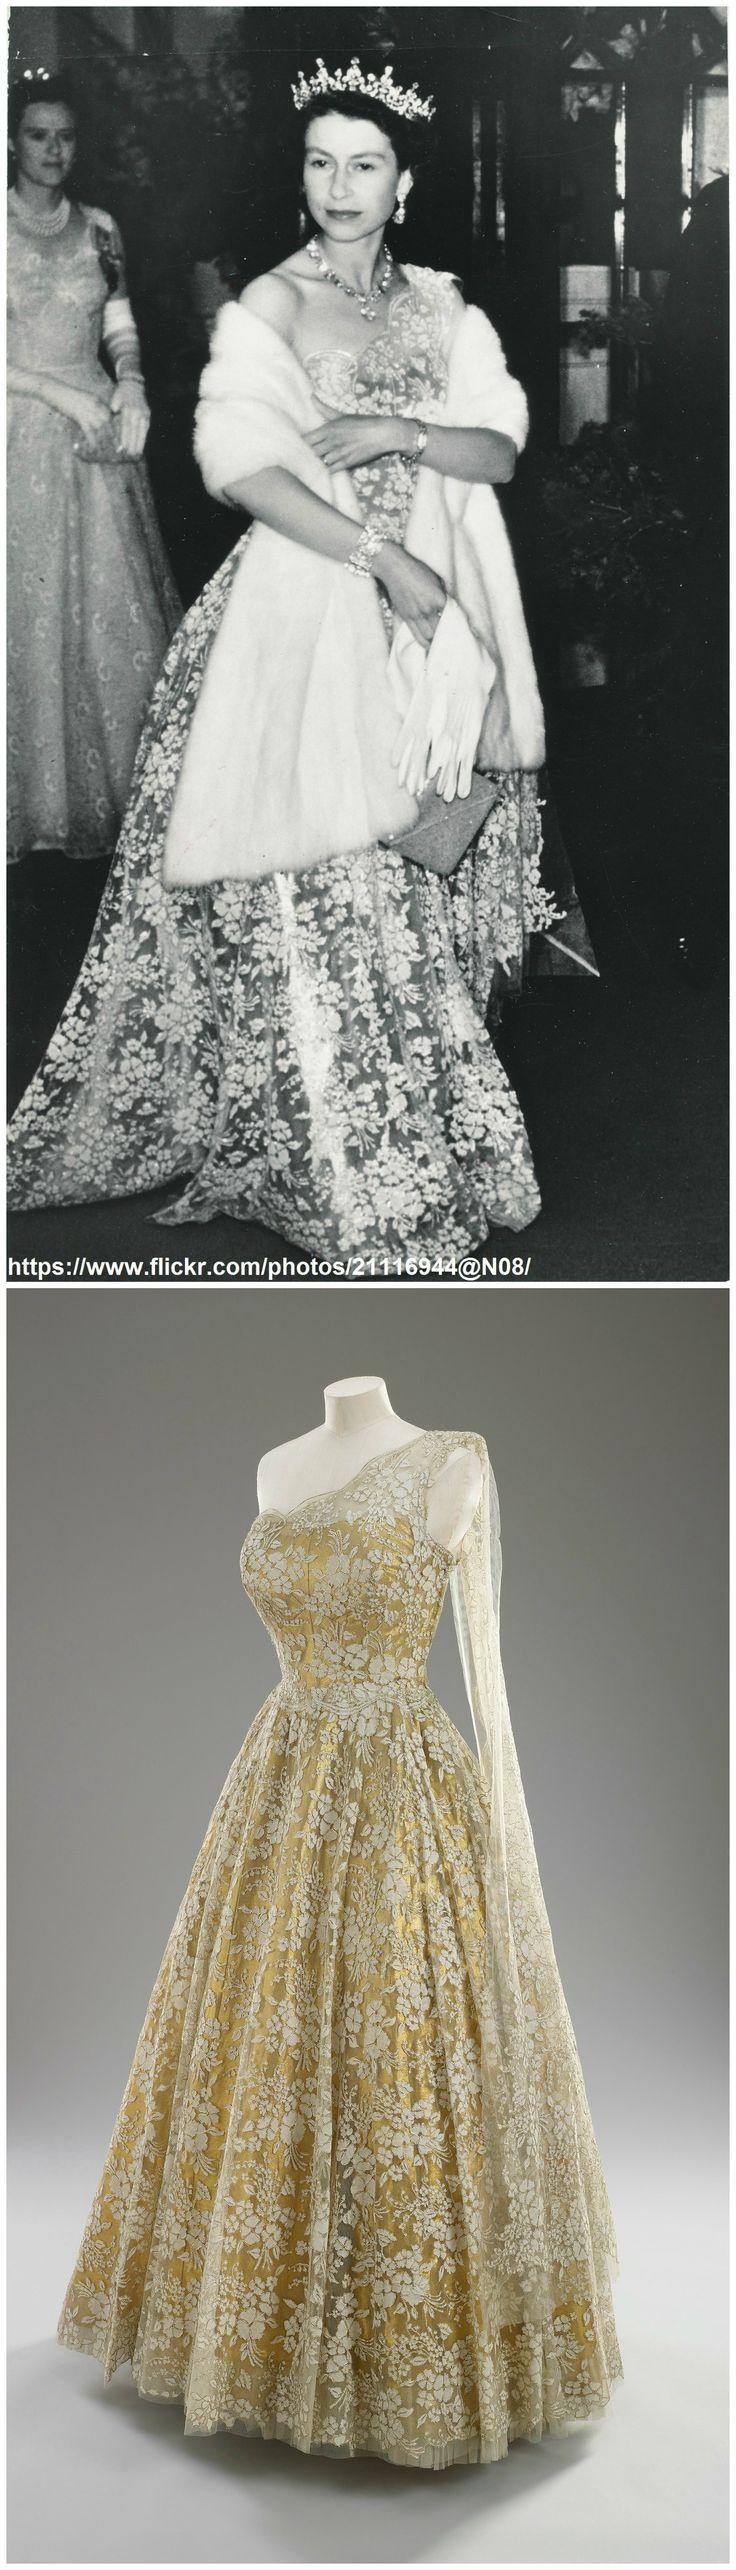 Best 20 norman hartnell ideas on pinterest queen for Wedding dresses norman ok